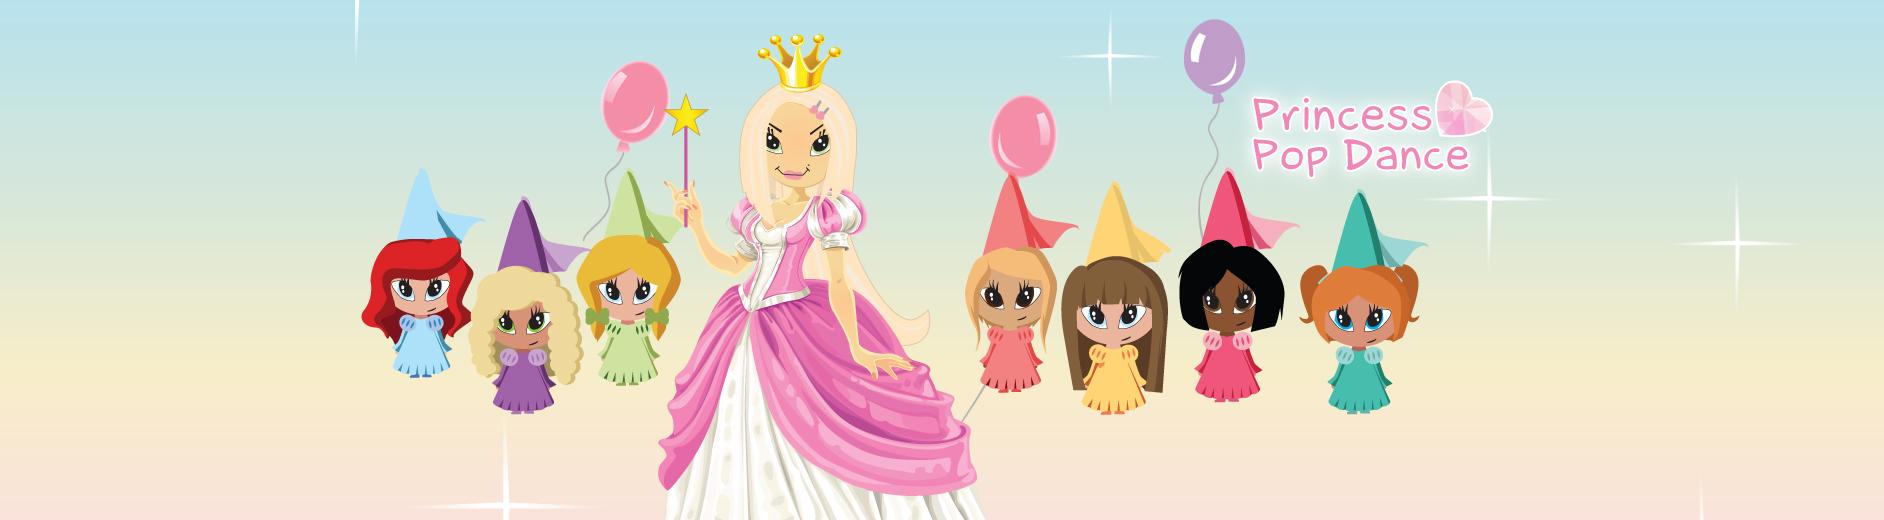 Princess Pop Dance